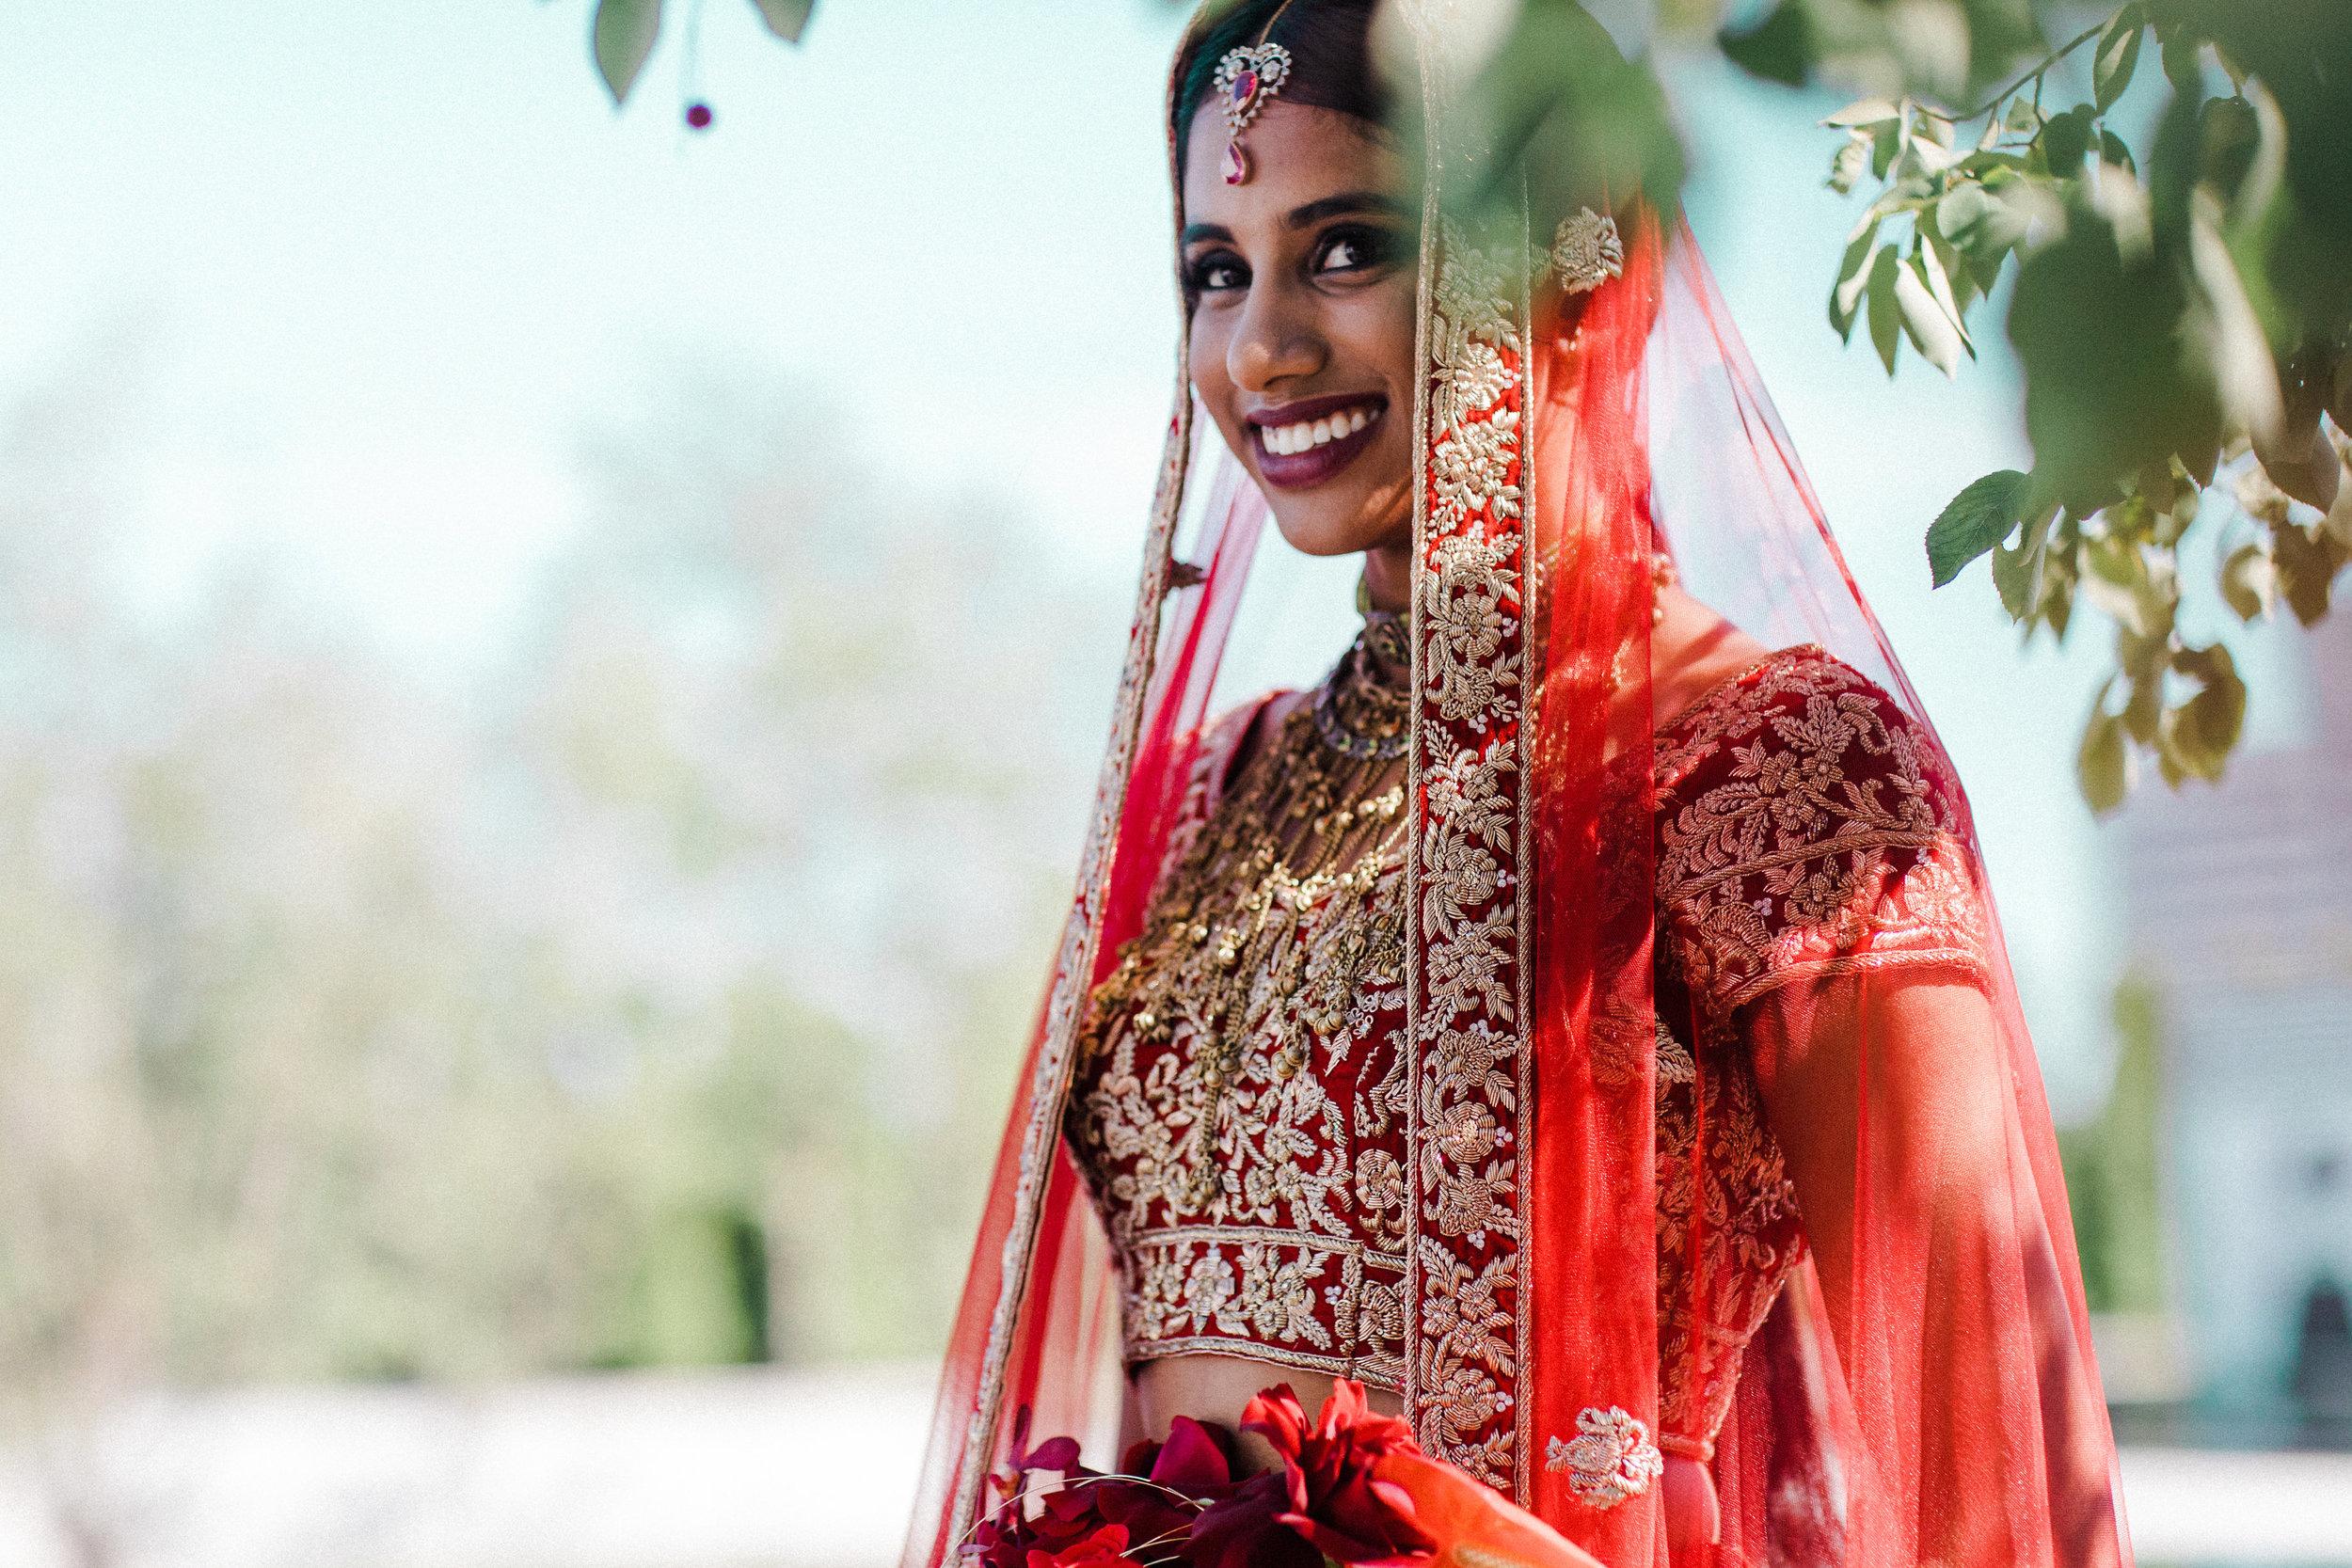 August In Bloom - Smiling bride - Scarlet Sweetheart (Lavish Dulhan)